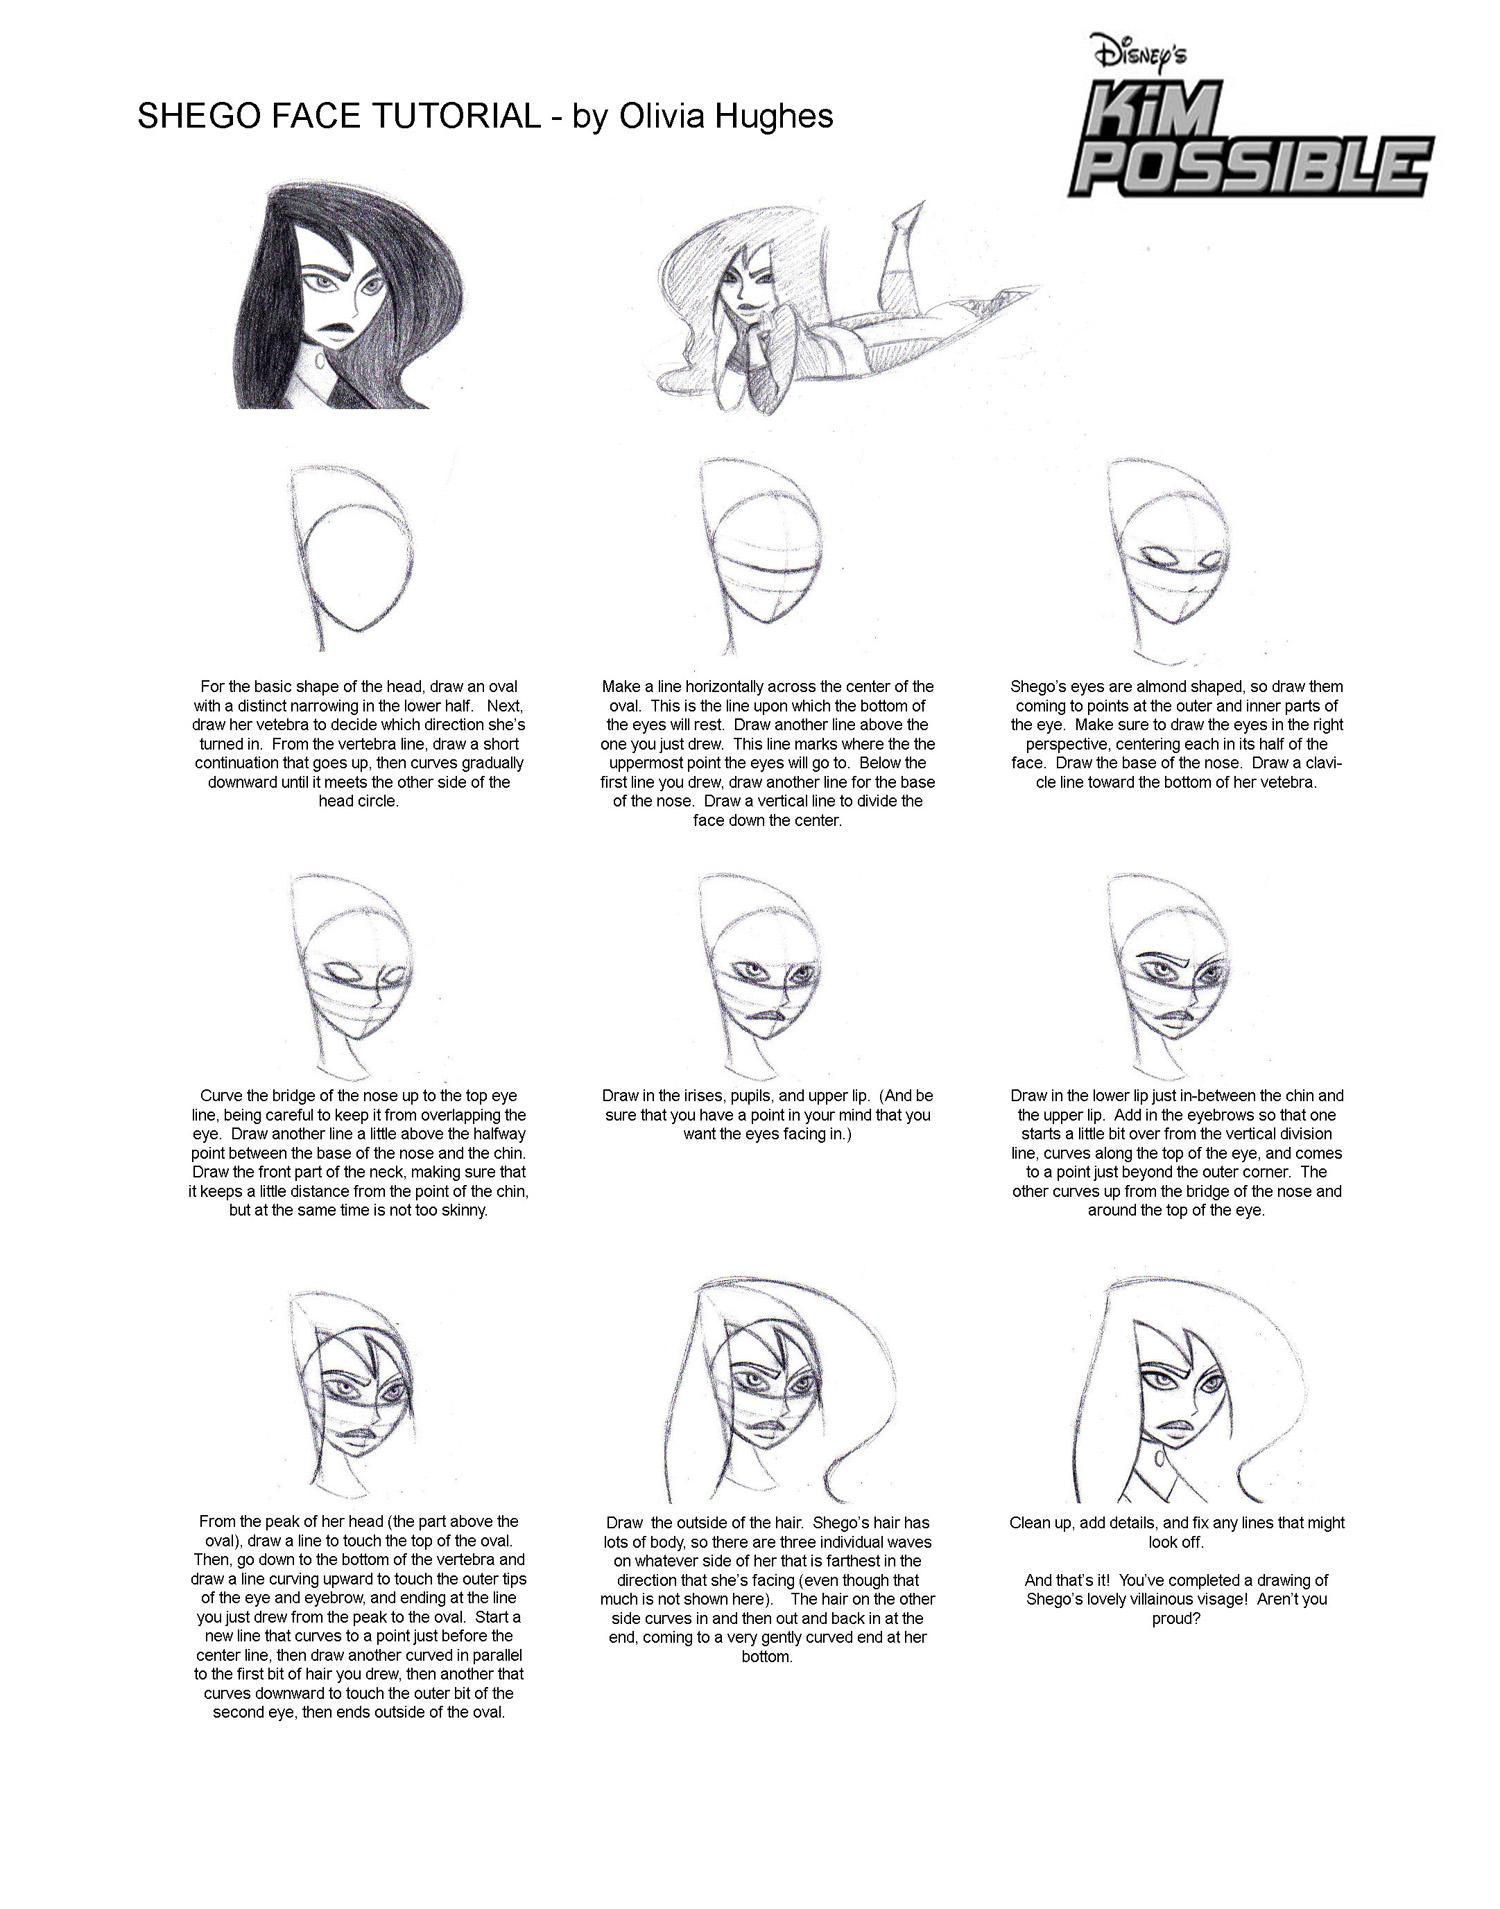 Shego Face Tutorial by skinny mini on DeviantArt